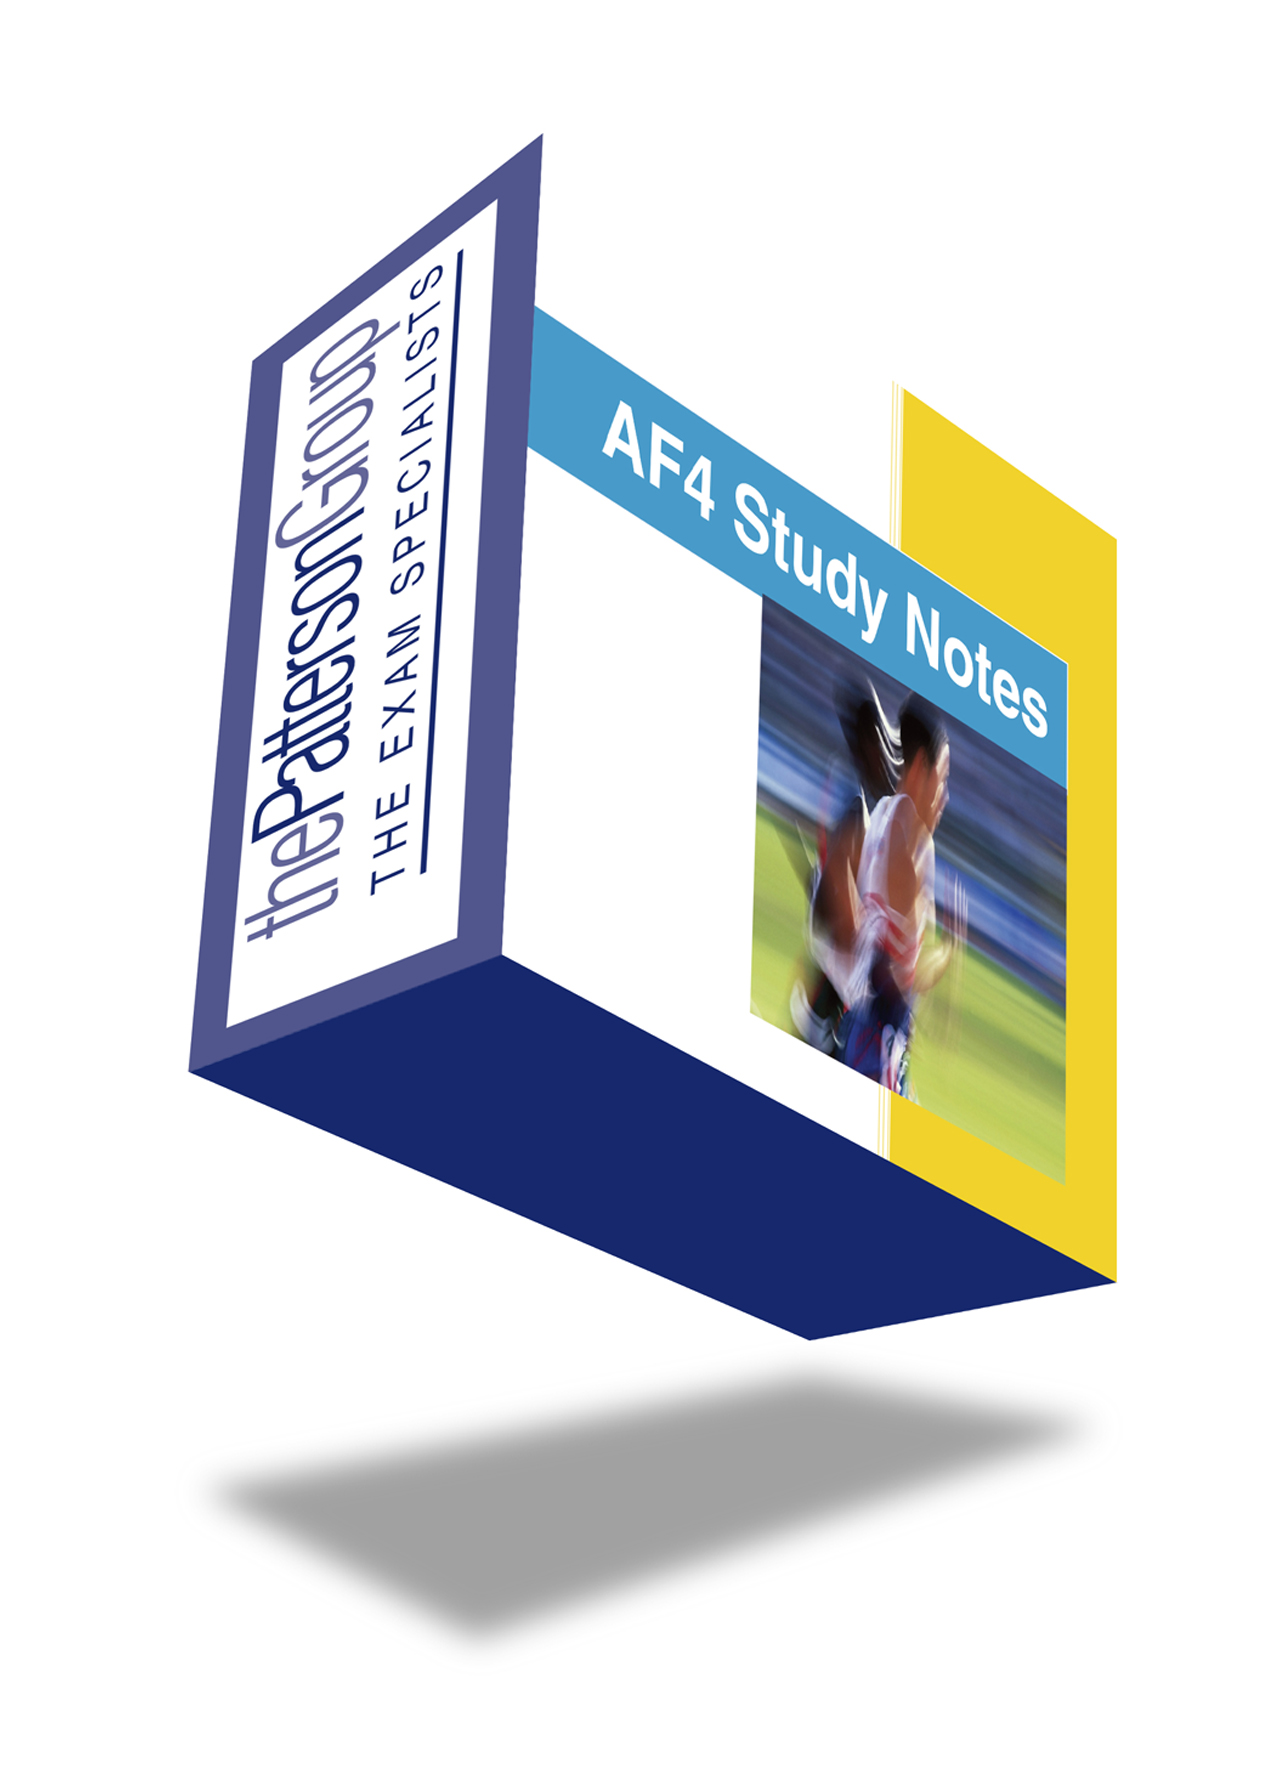 AF4 - Investment Planning - Study Notes